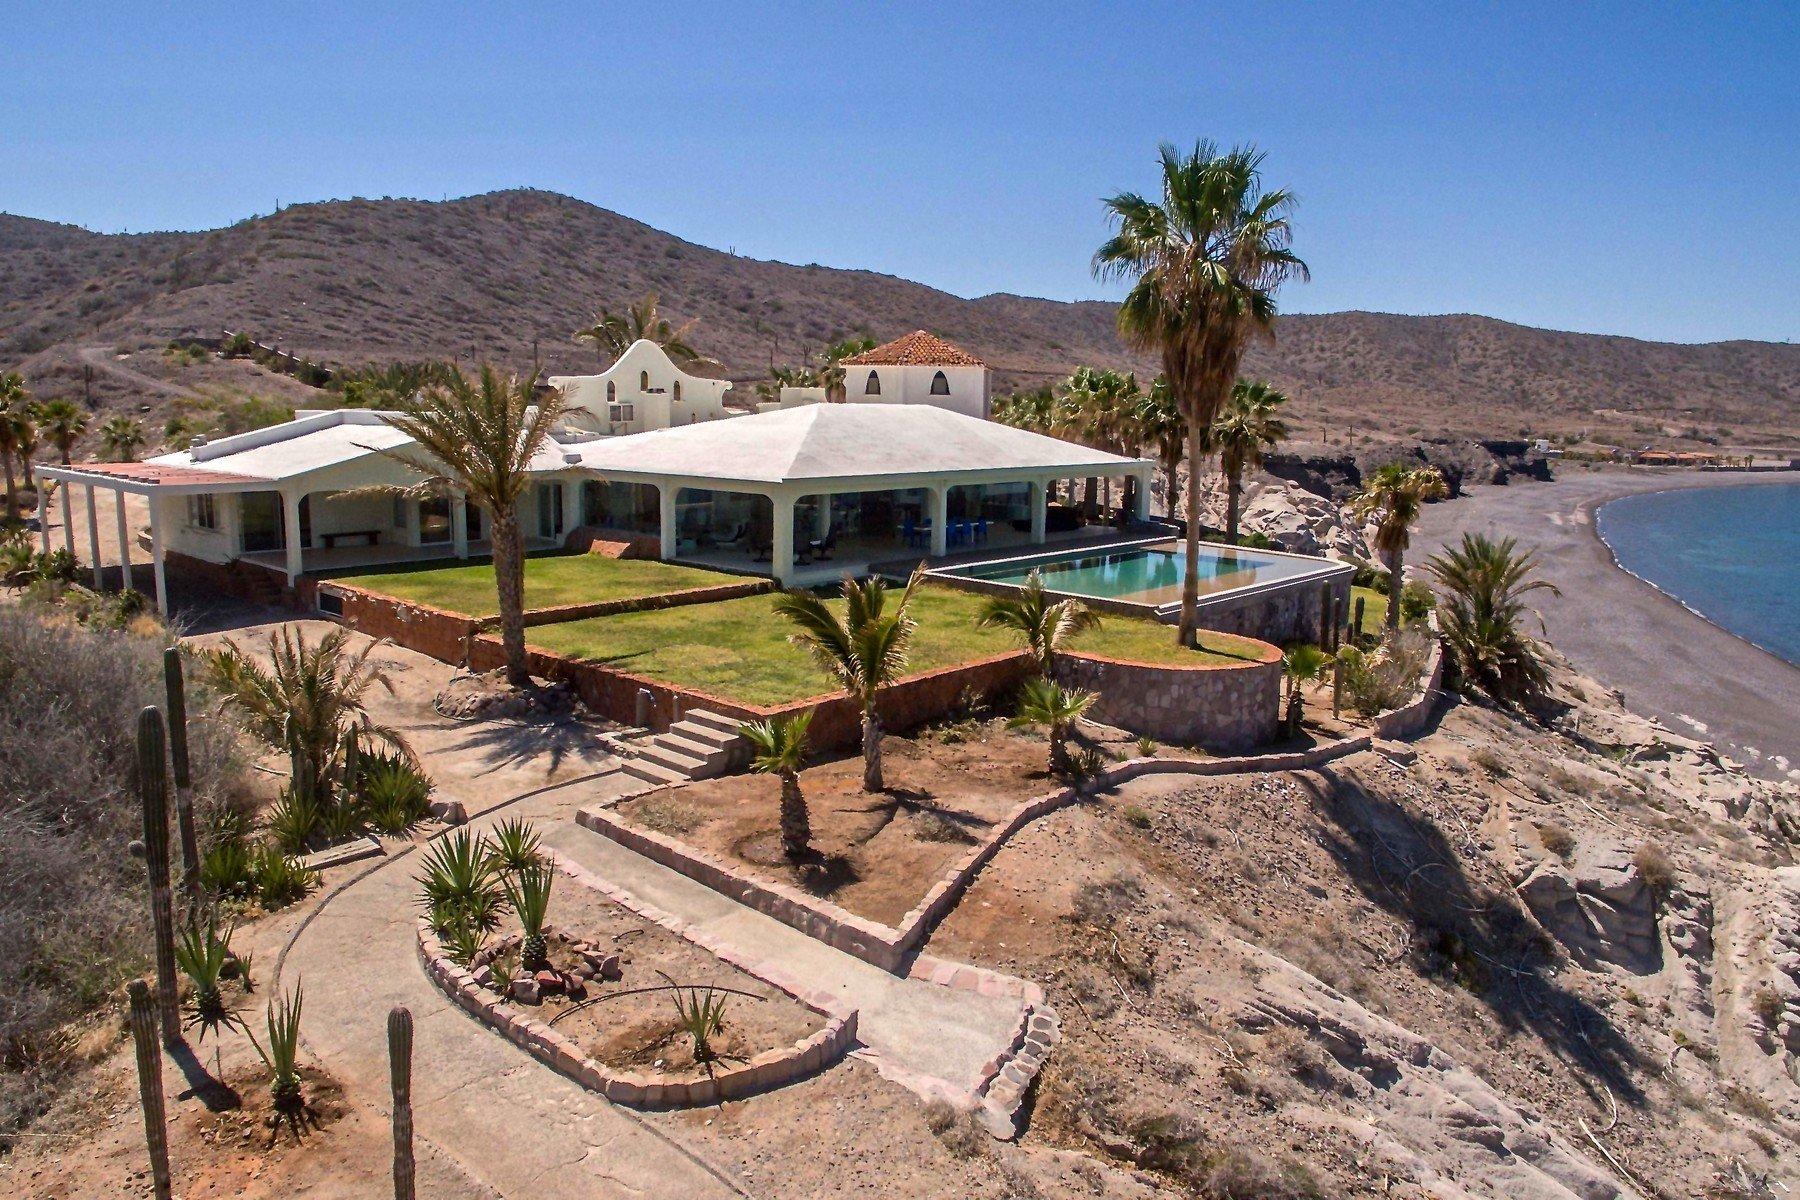 Land in Baja California Sur, Mexico 1 - 1383292